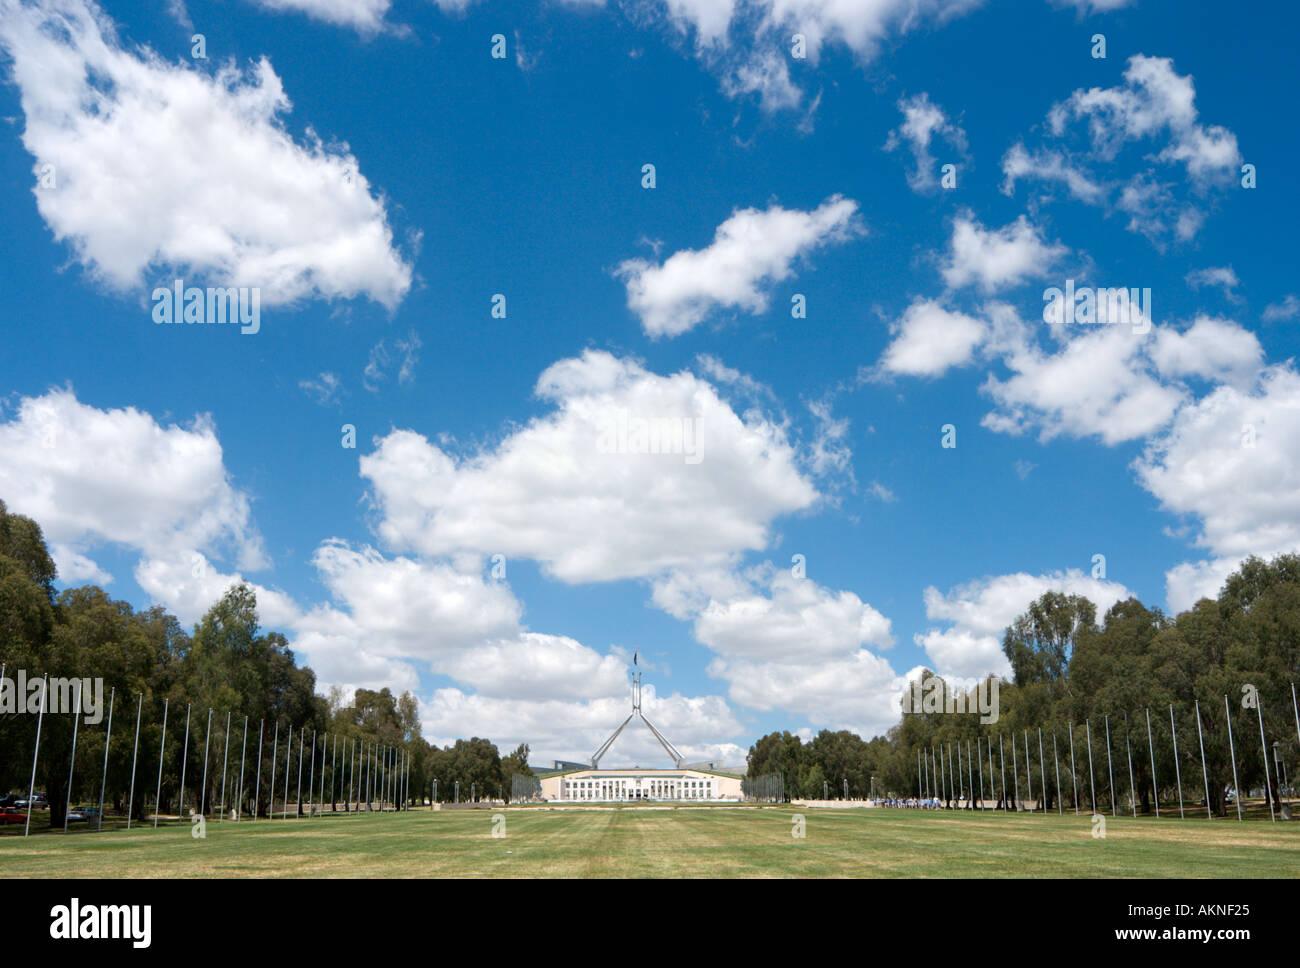 Parlament House, Canberra, Australian Capital Territory, Australien Stockbild